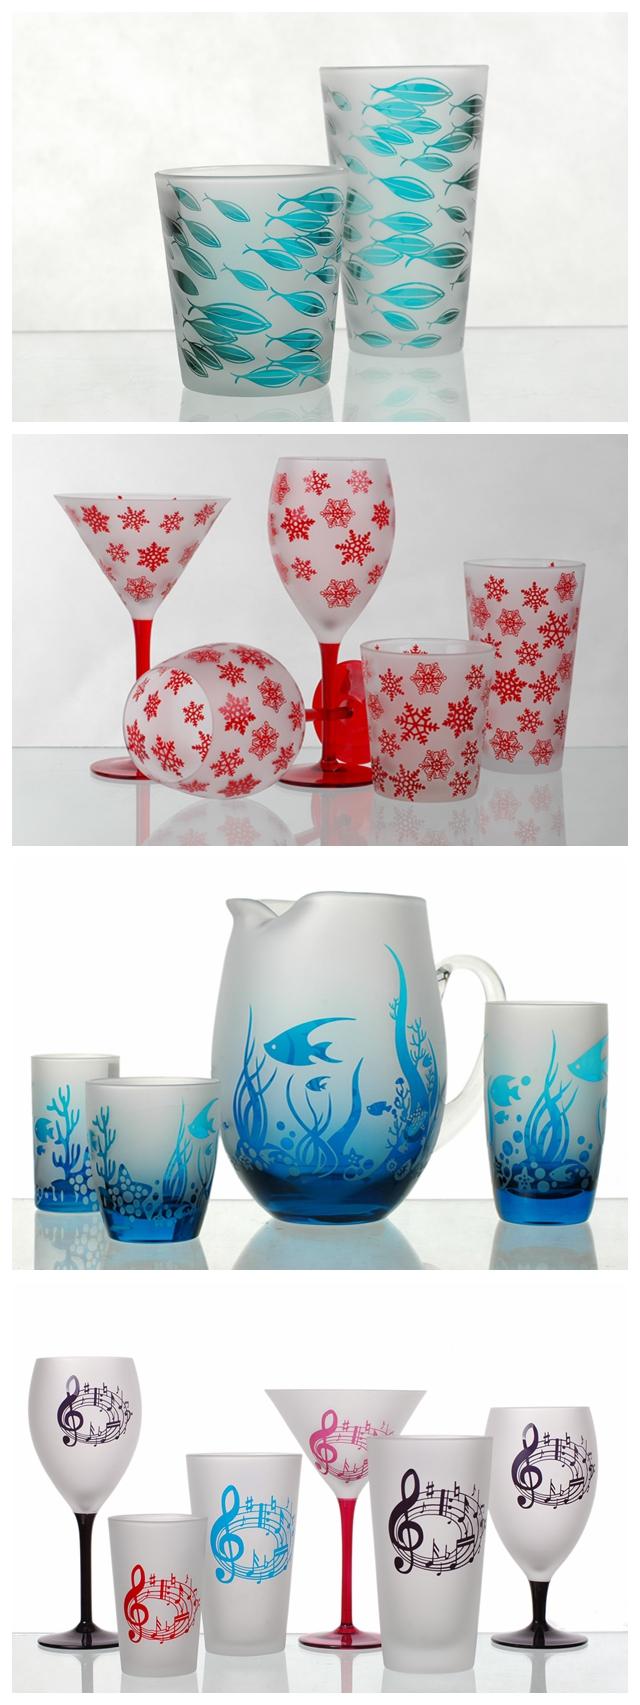 sandblasted glass cup set